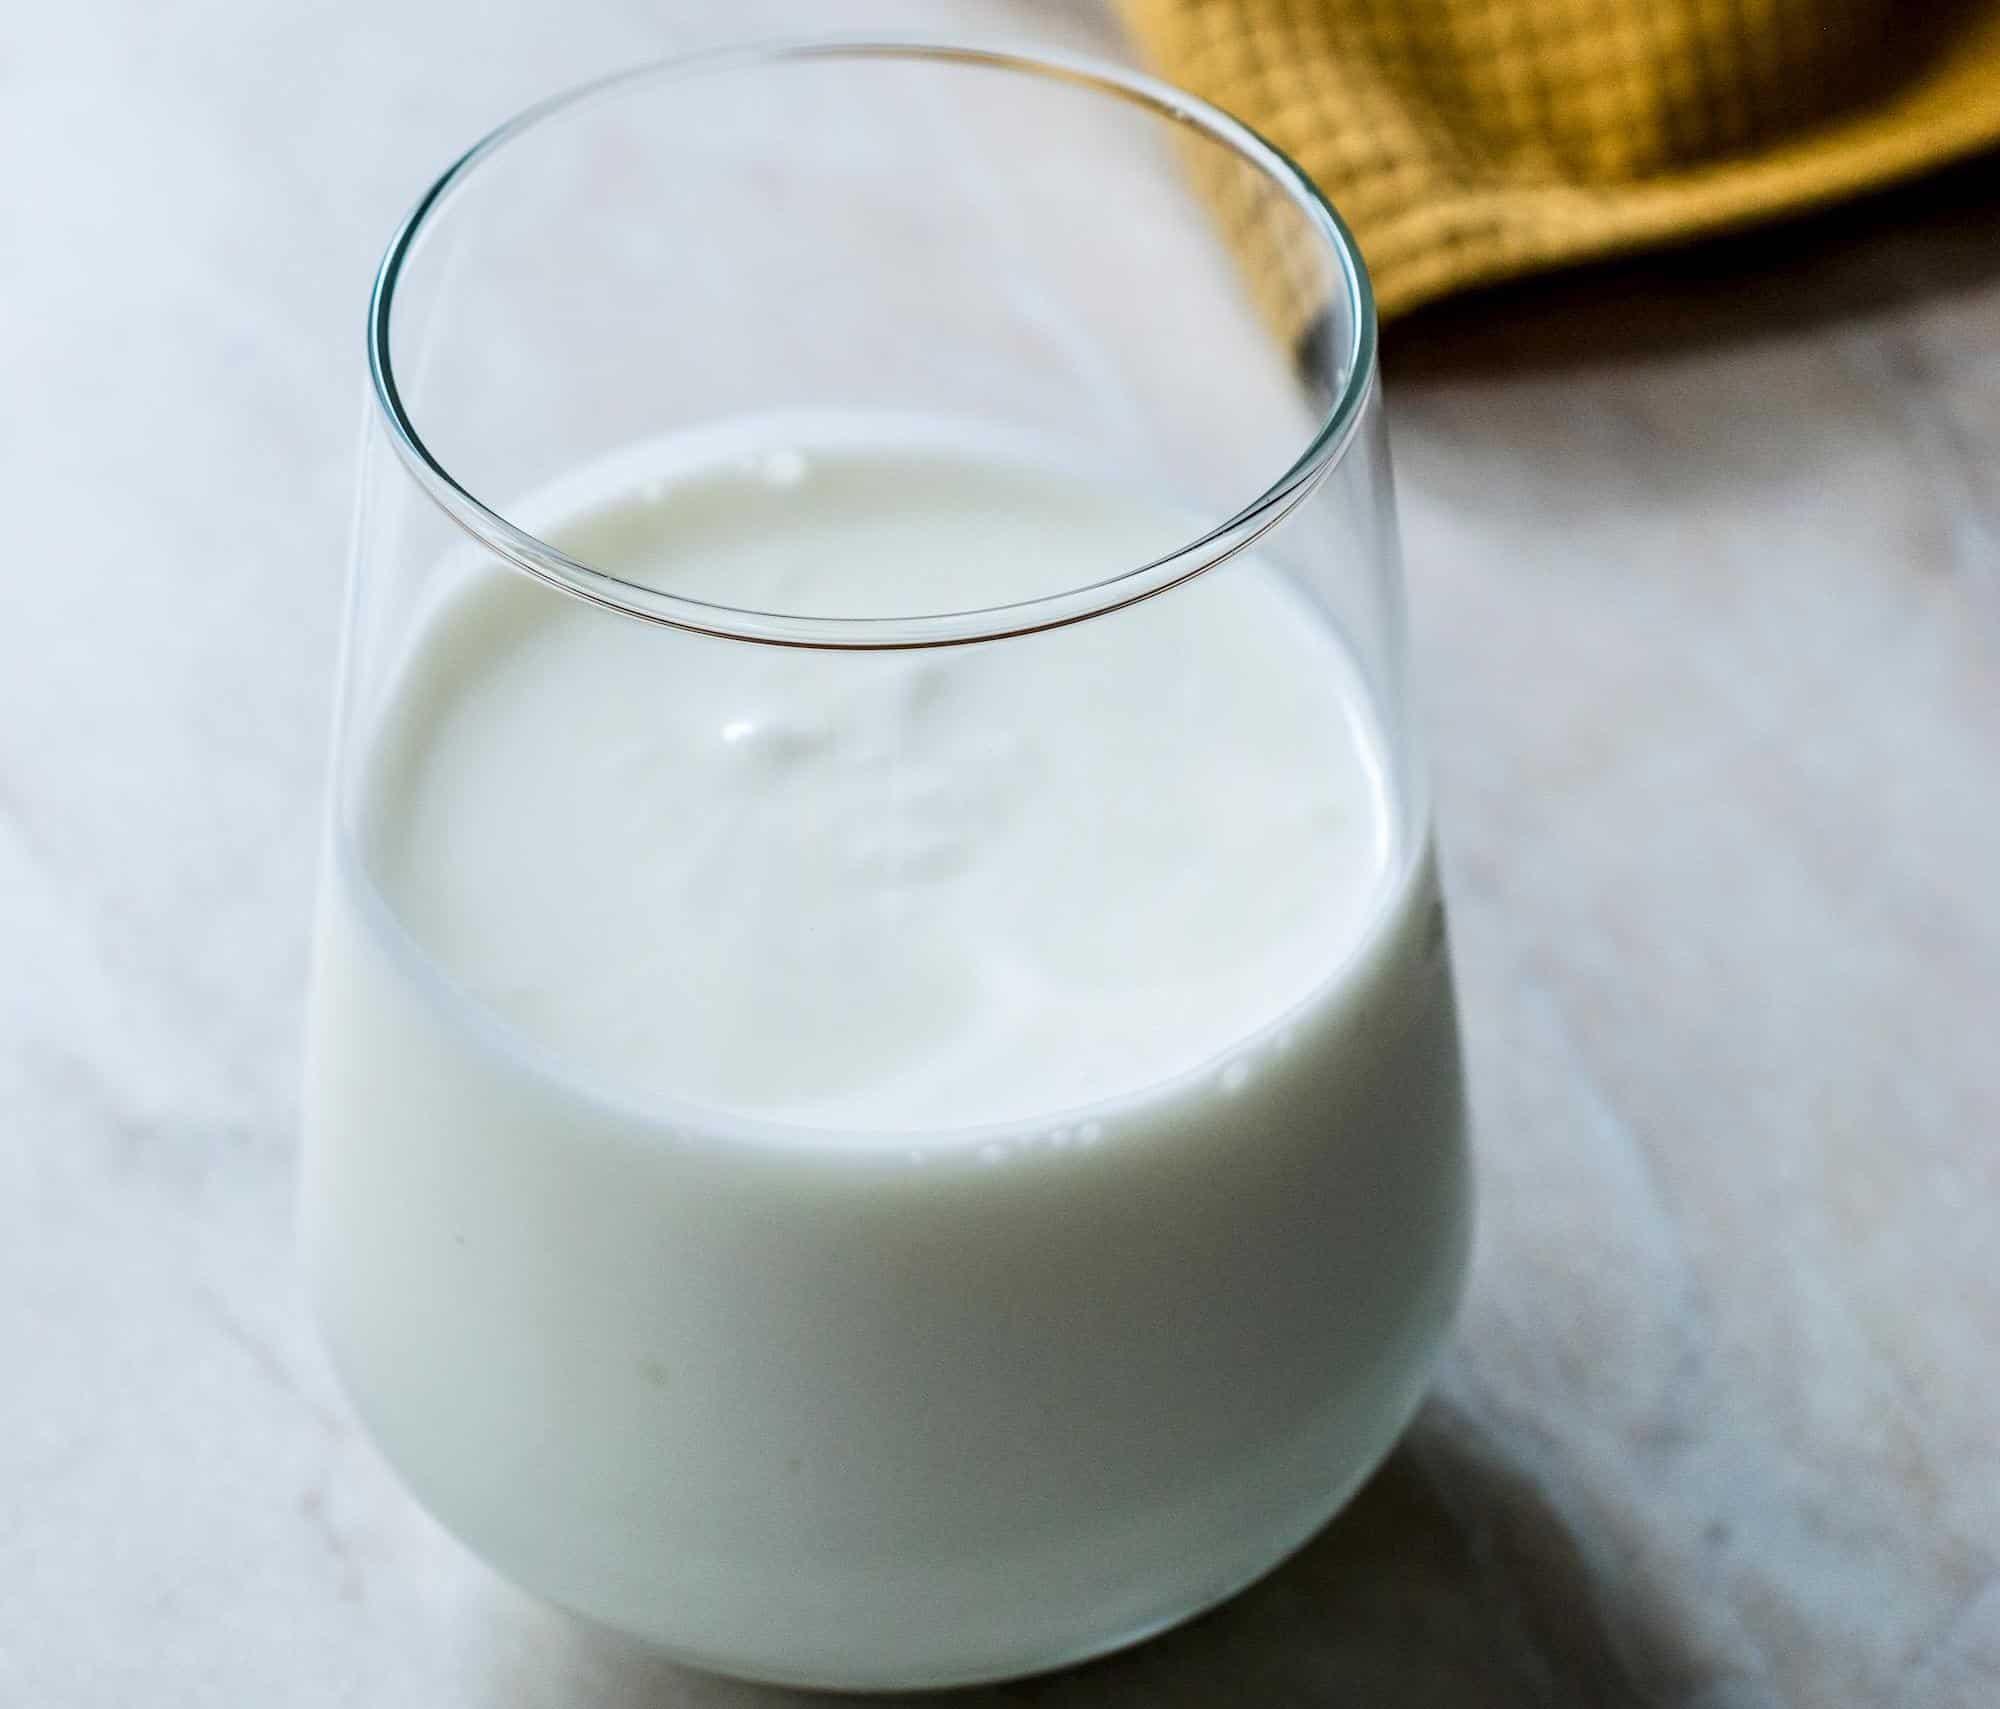 Probiotic yoghurt